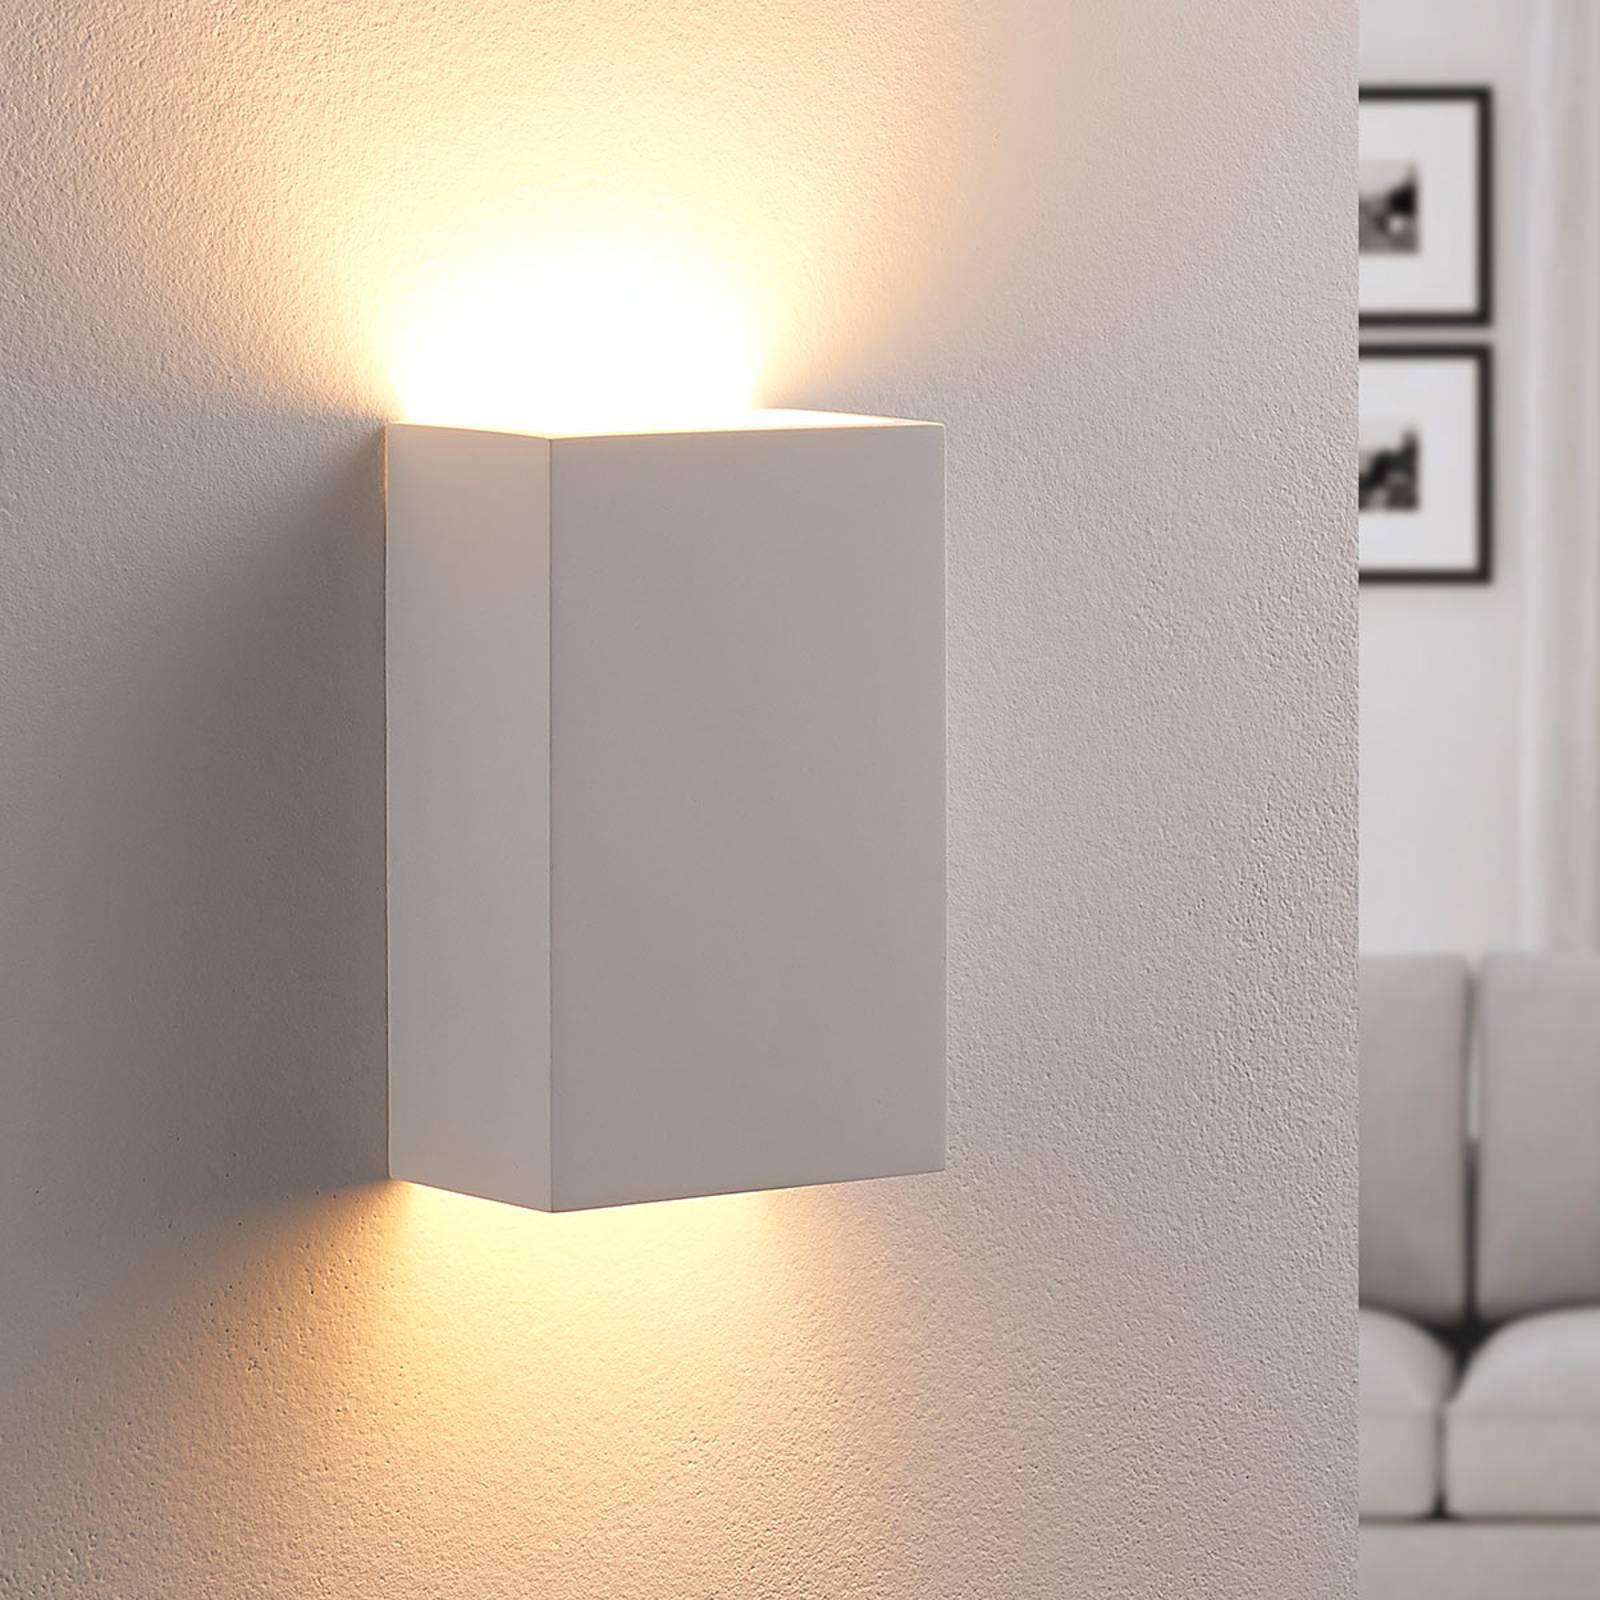 Colja - kantige LED-Wandleuchte aus Gips